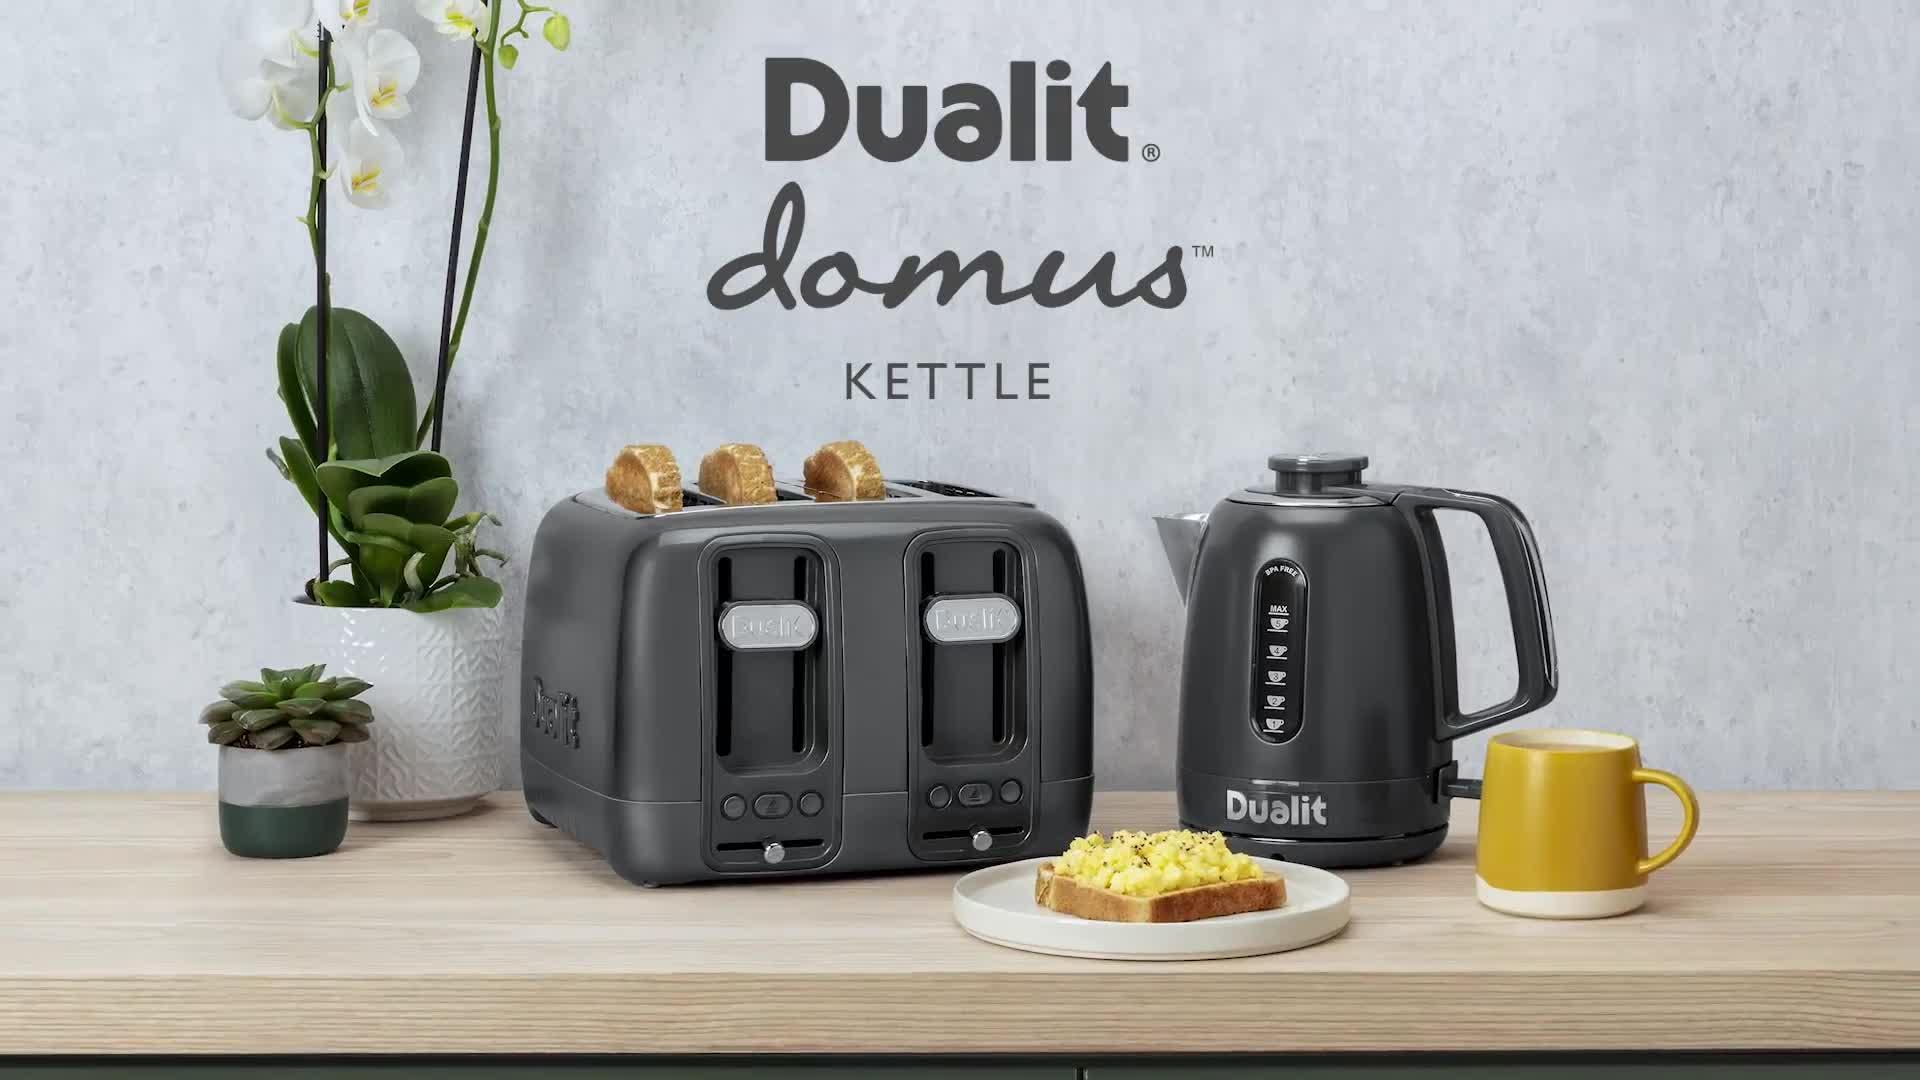 Grey Dualit Domus Kettle